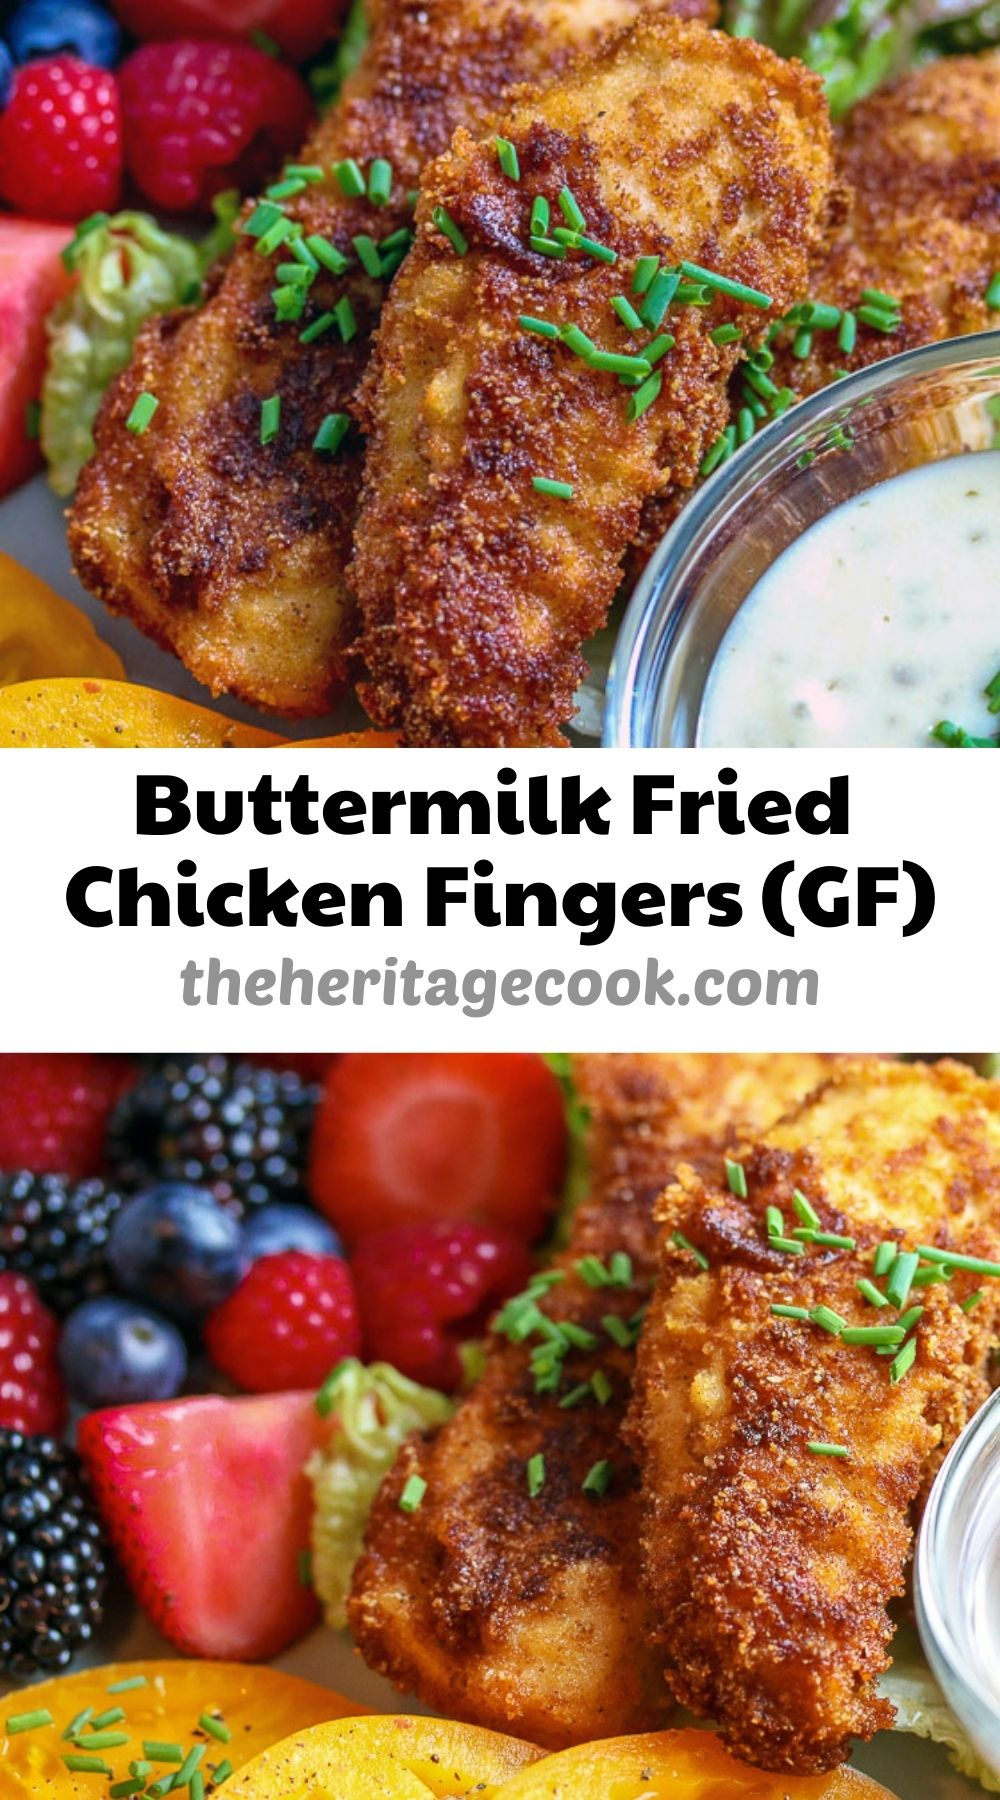 Buttermilk Fried Chicken Fingers © 2021 Jane Bonacci, The Heritage Cook